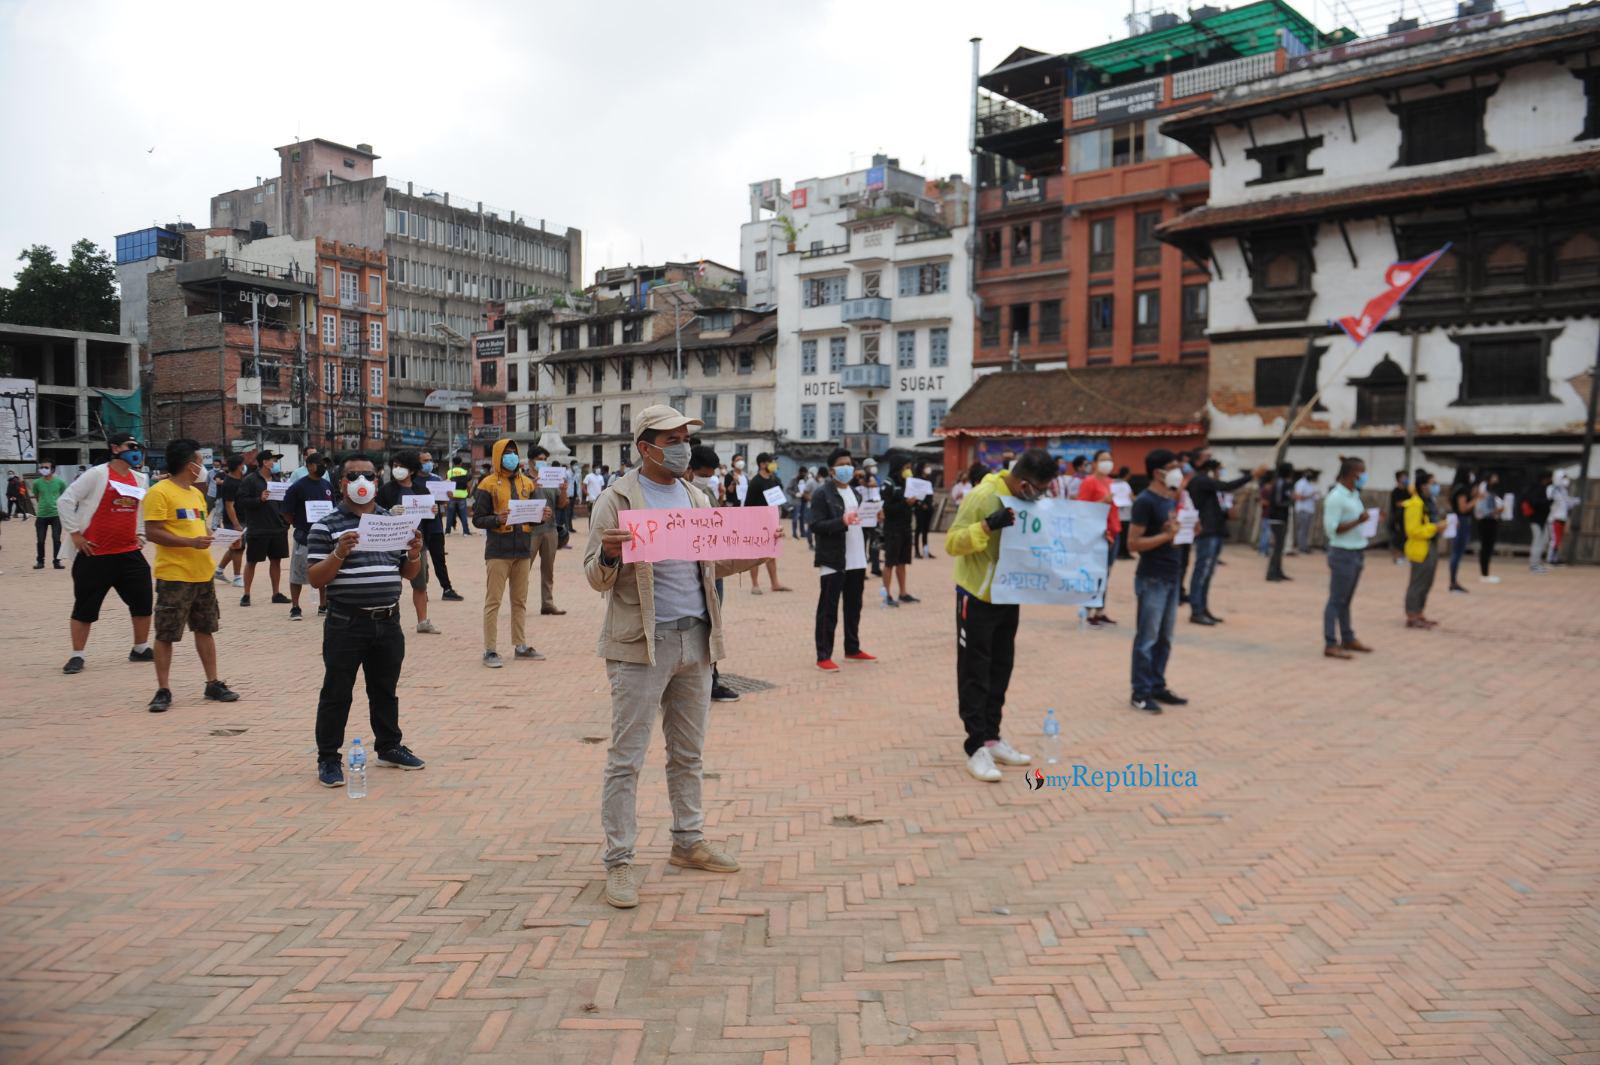 PHOTOS: Anti-government demonstration continues at Basantapur